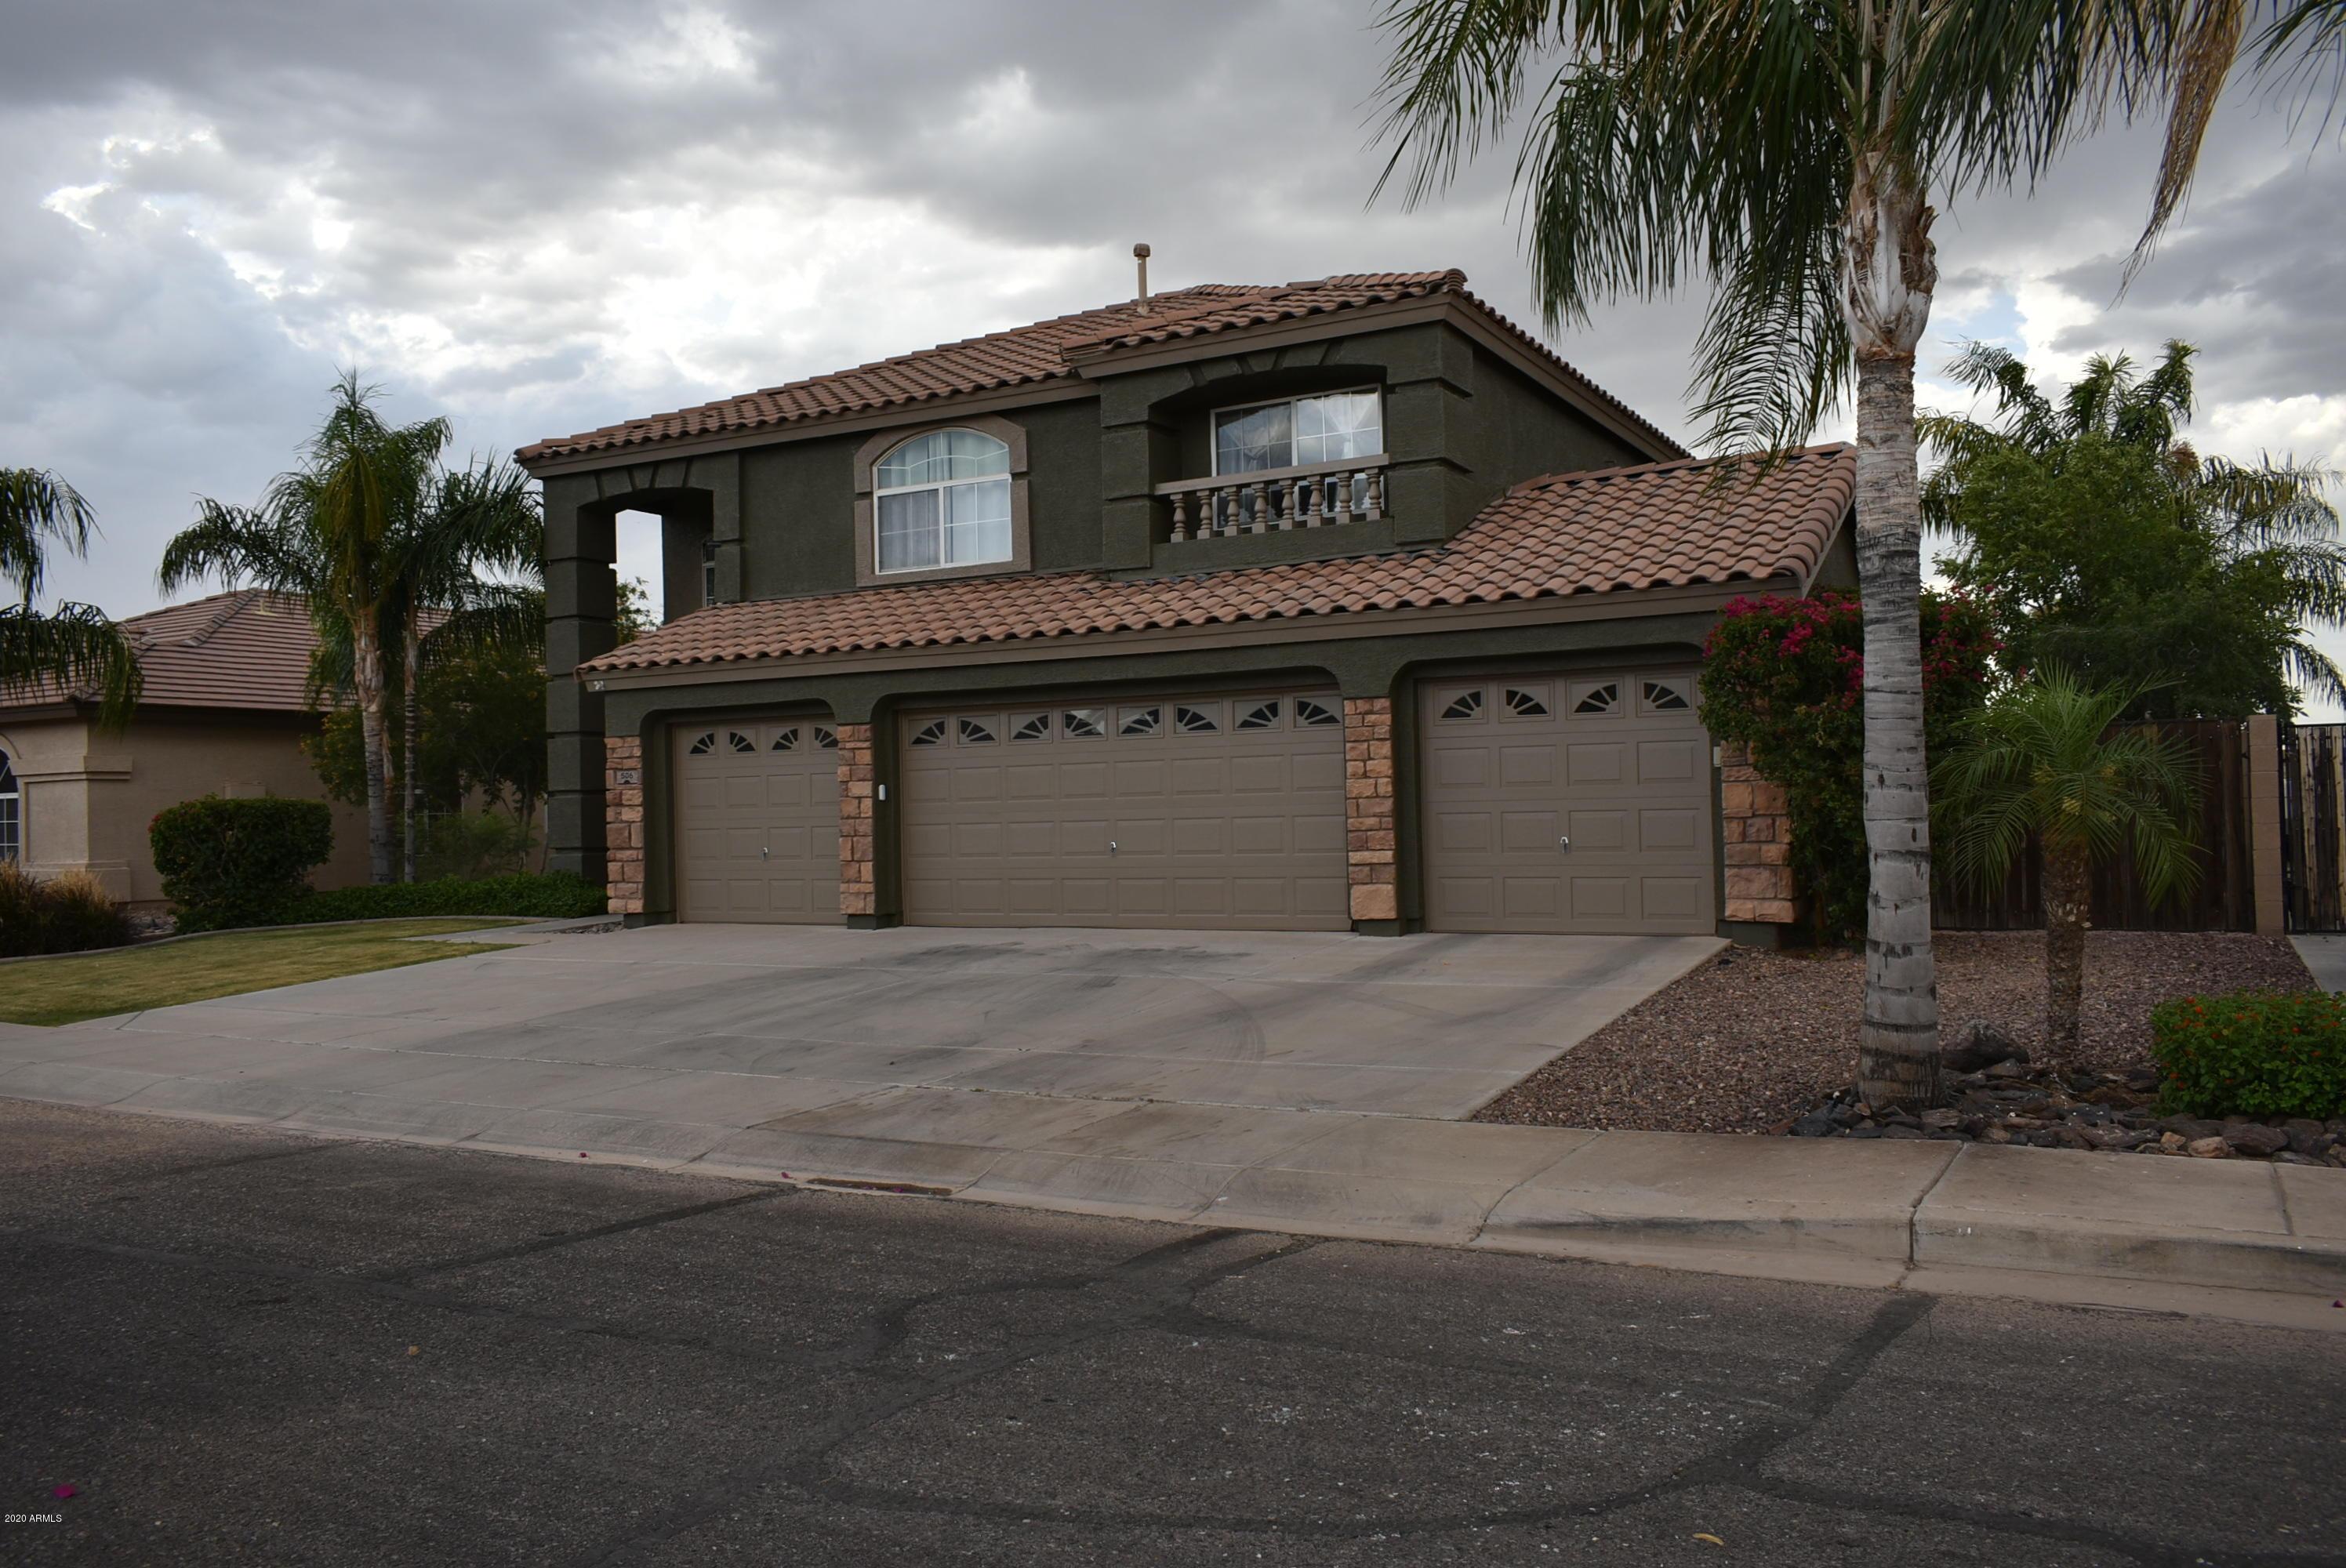 Photo of 506 E ROSEBUD Drive, San Tan Valley, AZ 85143